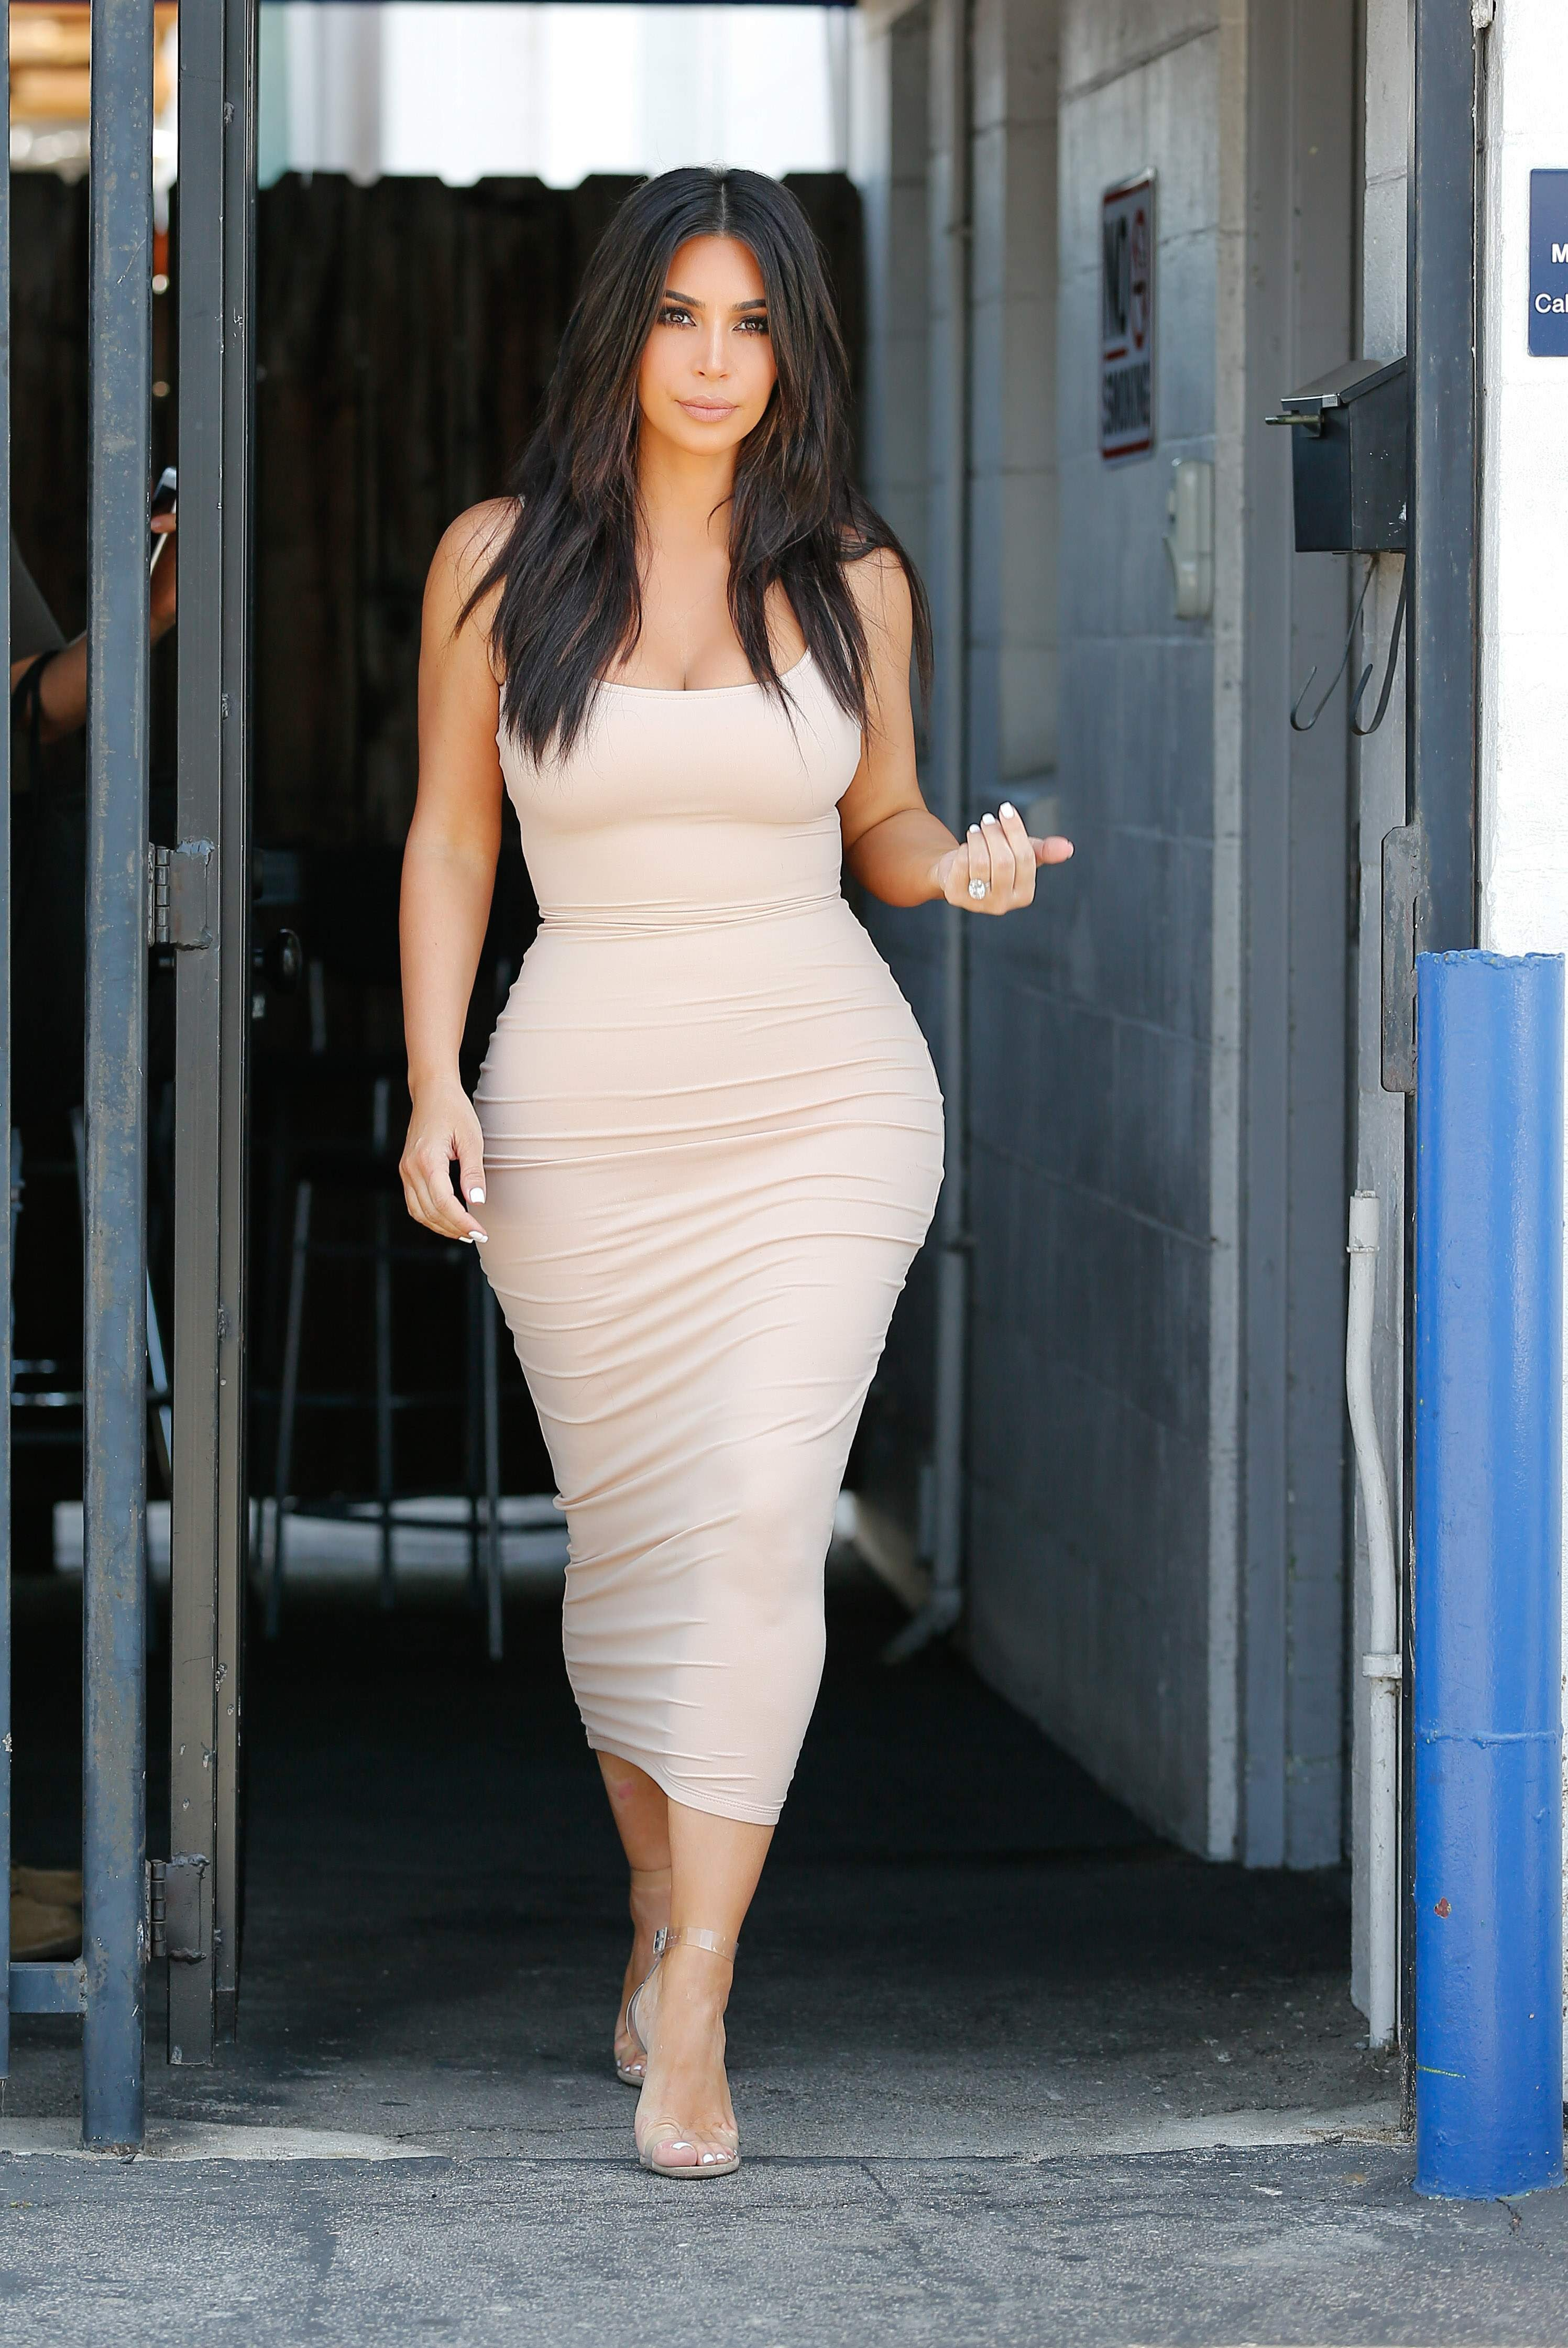 62a62ec8f675 Kim Kardashian leaving the studio in Van Nuys June 3-2016 047.jpg ...